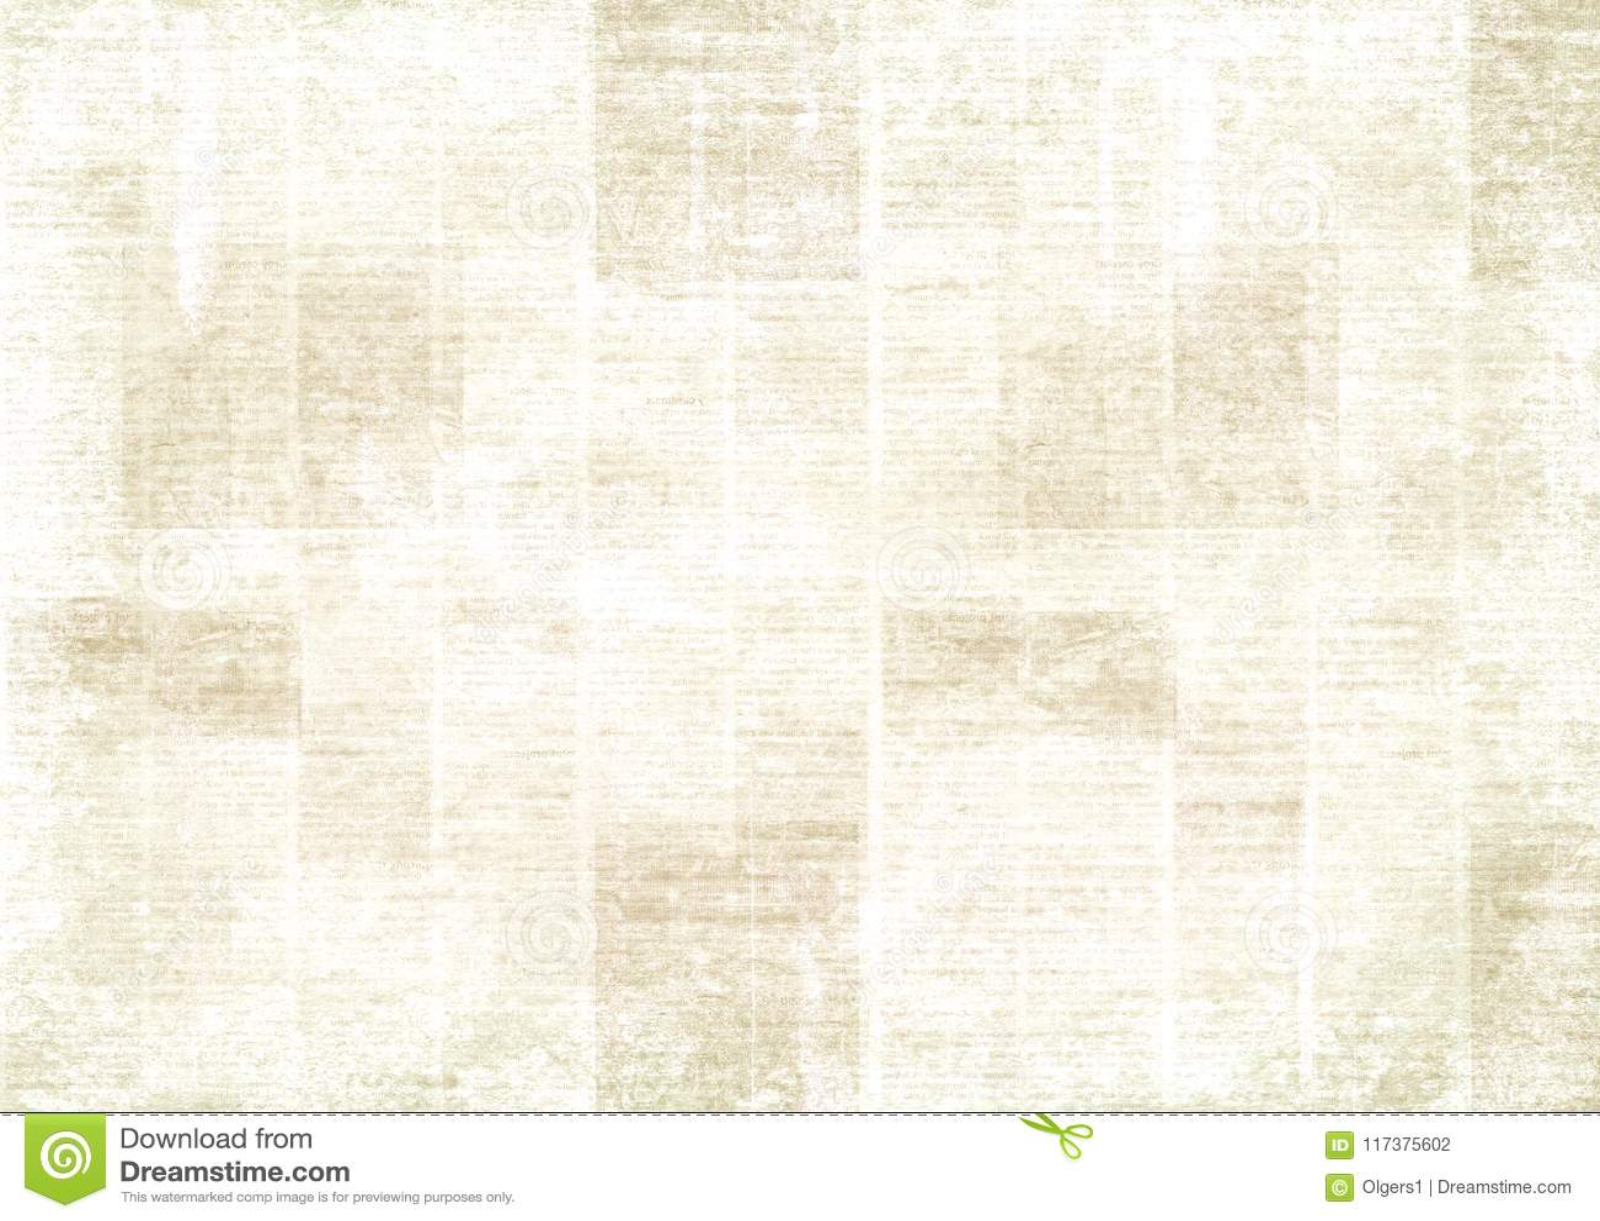 Vintage Grunge Newspaper Collage Background Stock Photo